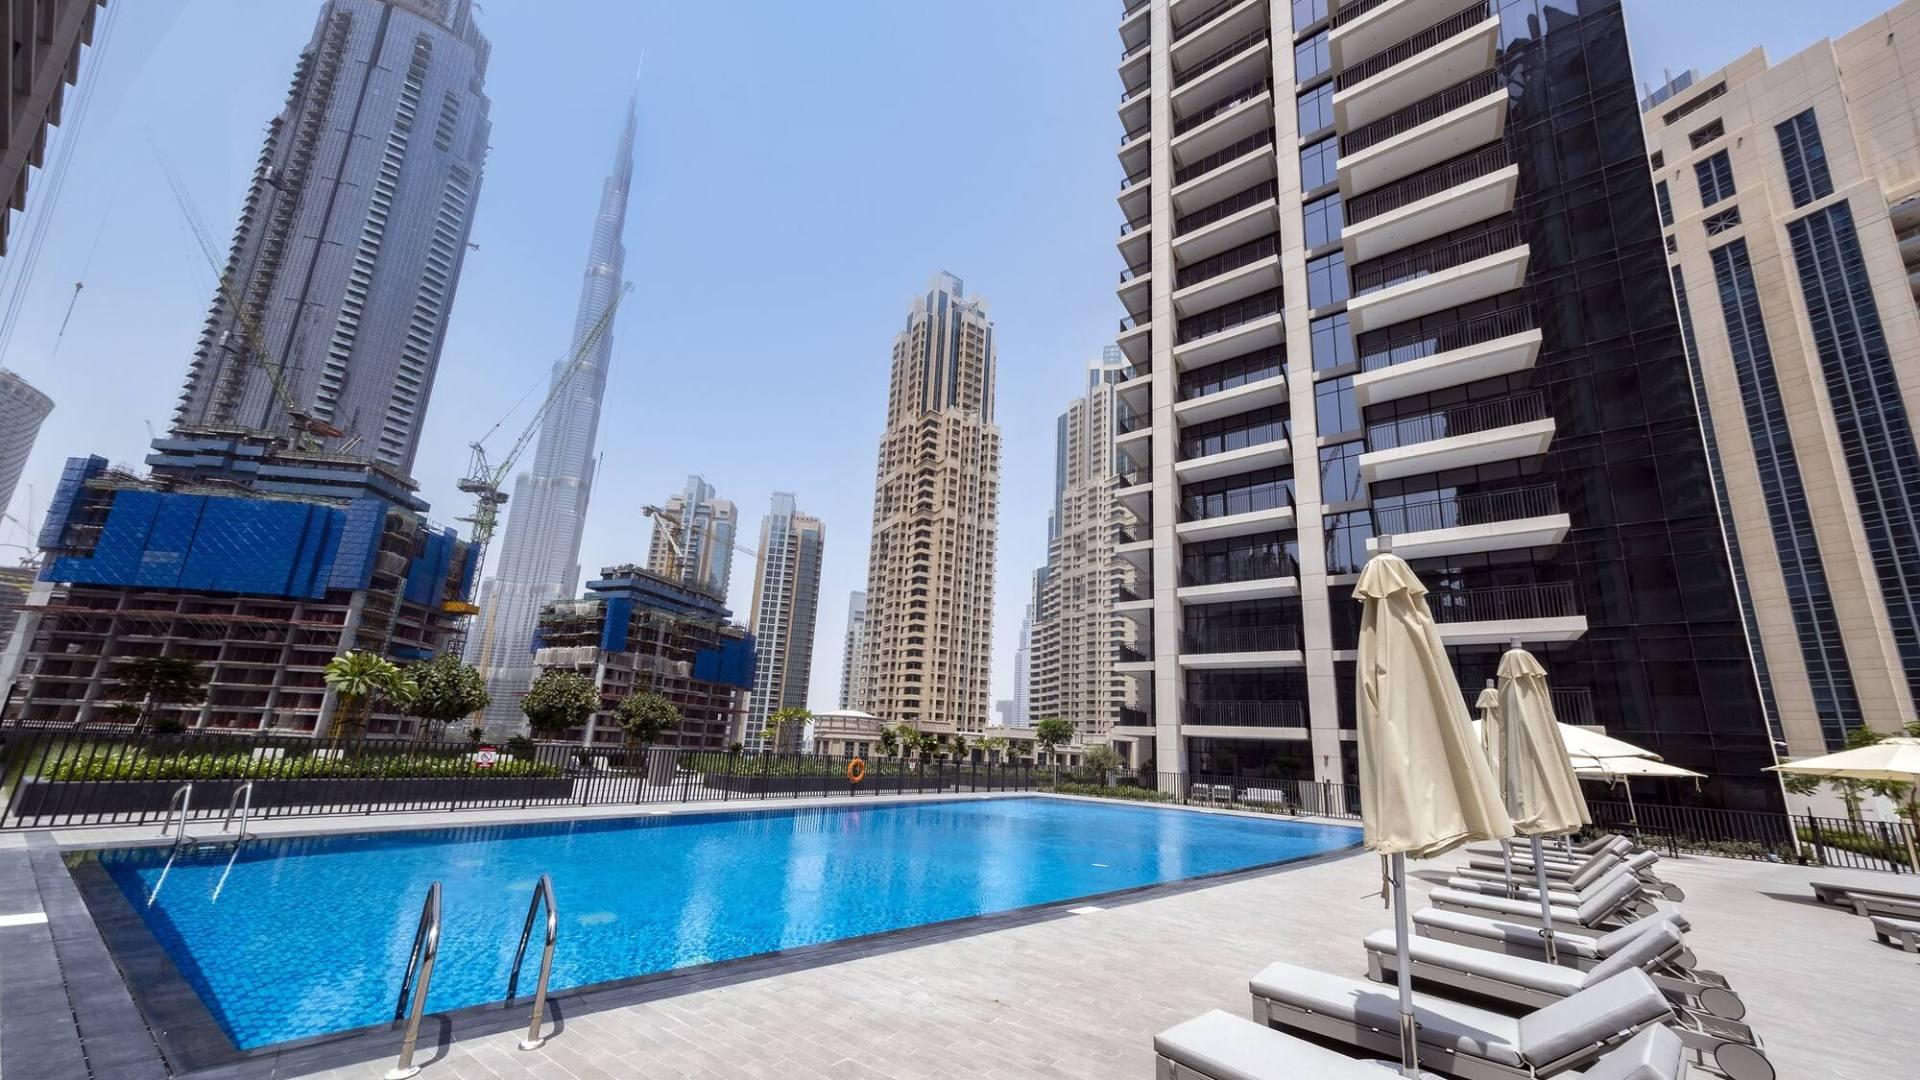 BLVD CRESCENT, Downtown Dubai, UAE – photo 8